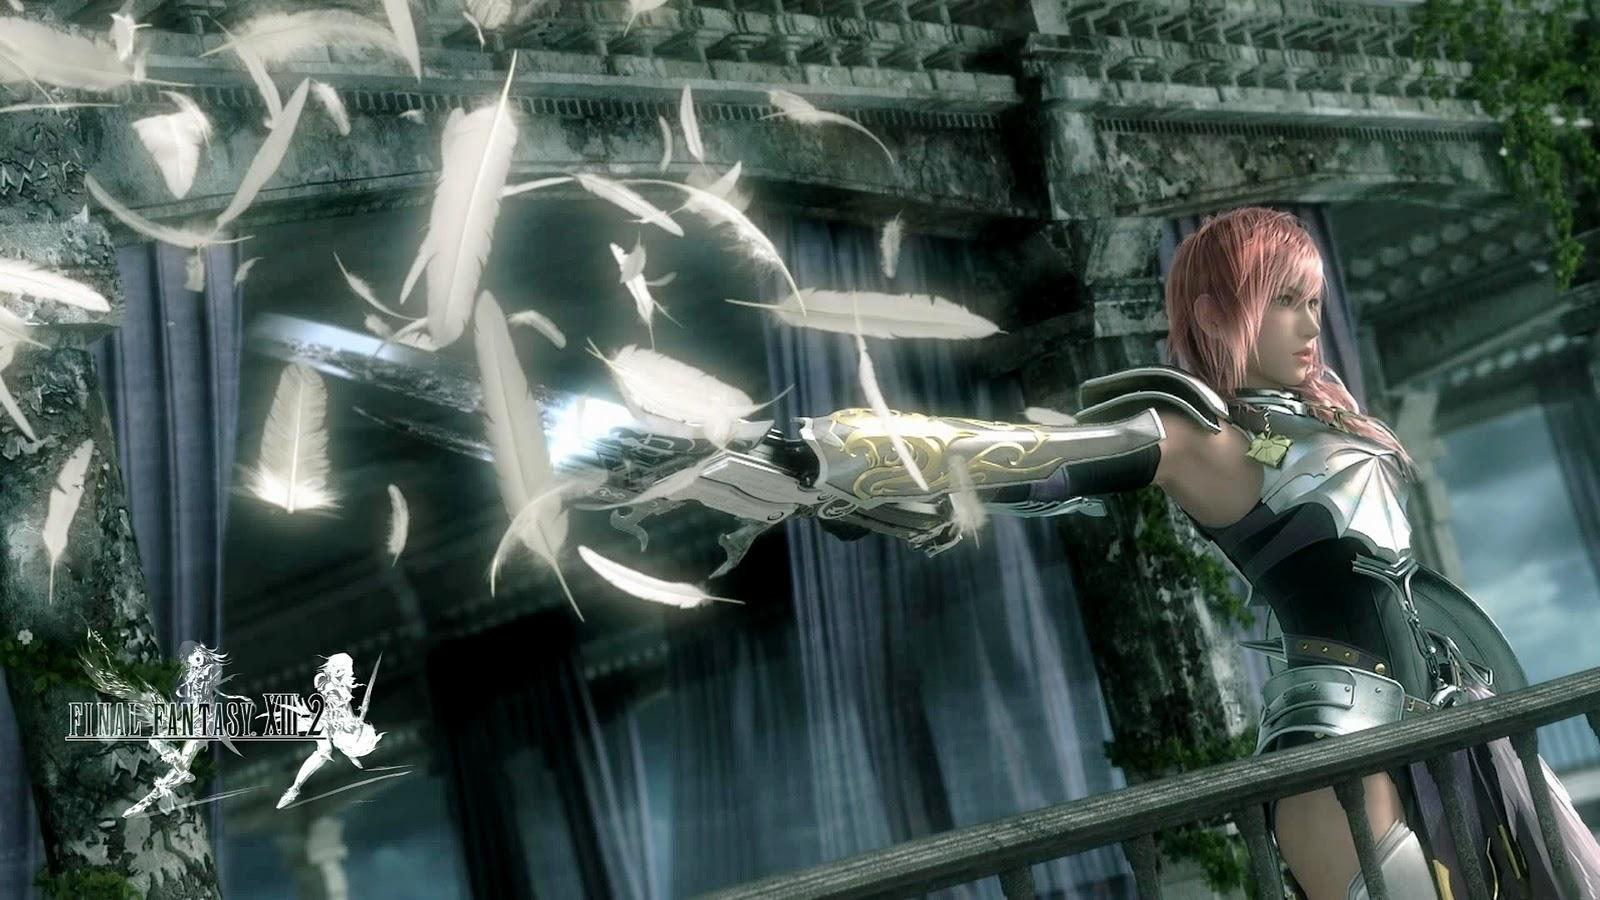 THE BING Final Fantasy XIII 2 Game Wallpaper 1600x900